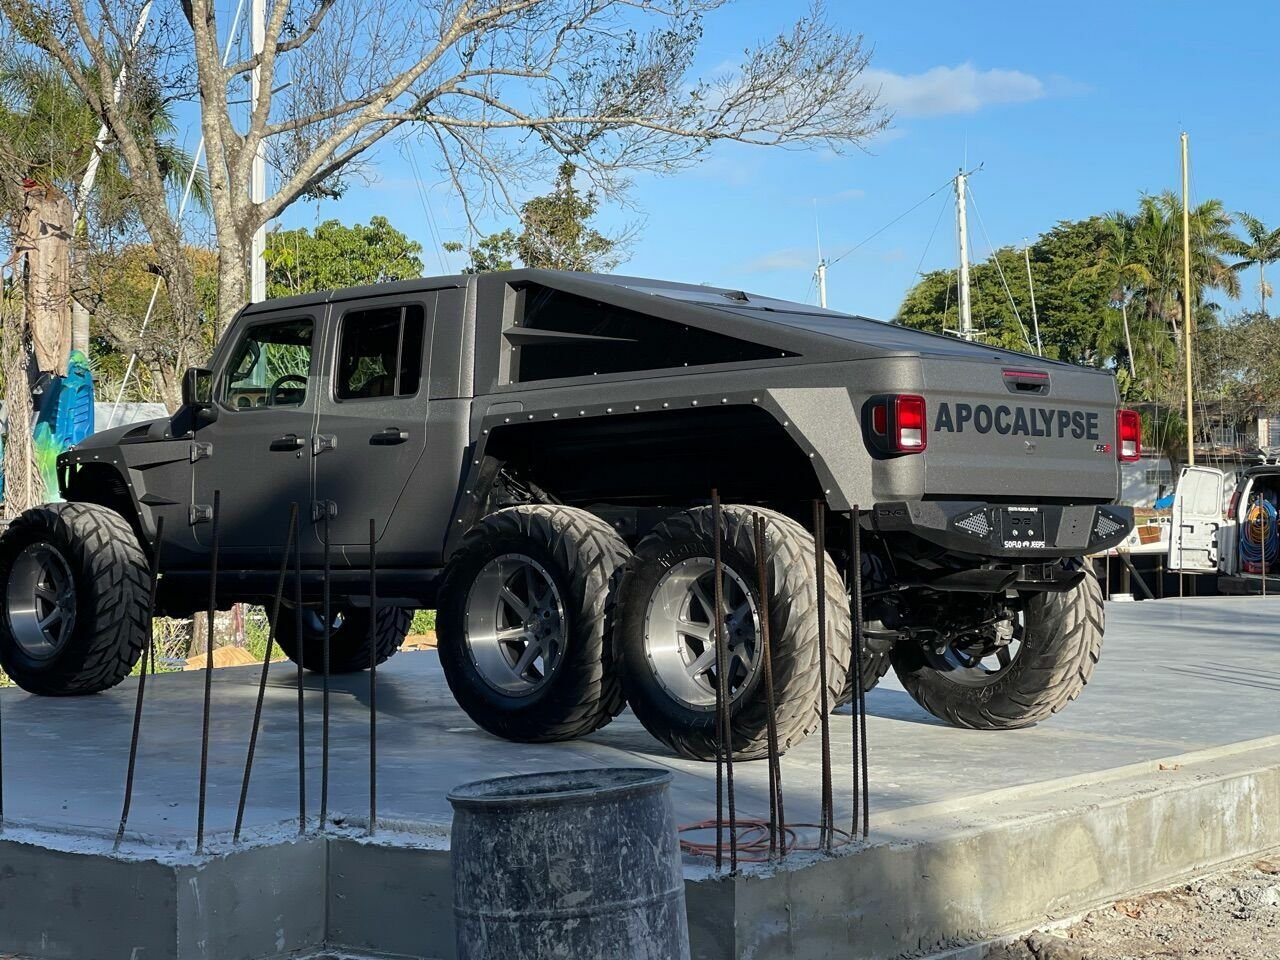 Jeep-Apocalypse-Hellfire-6x6-5